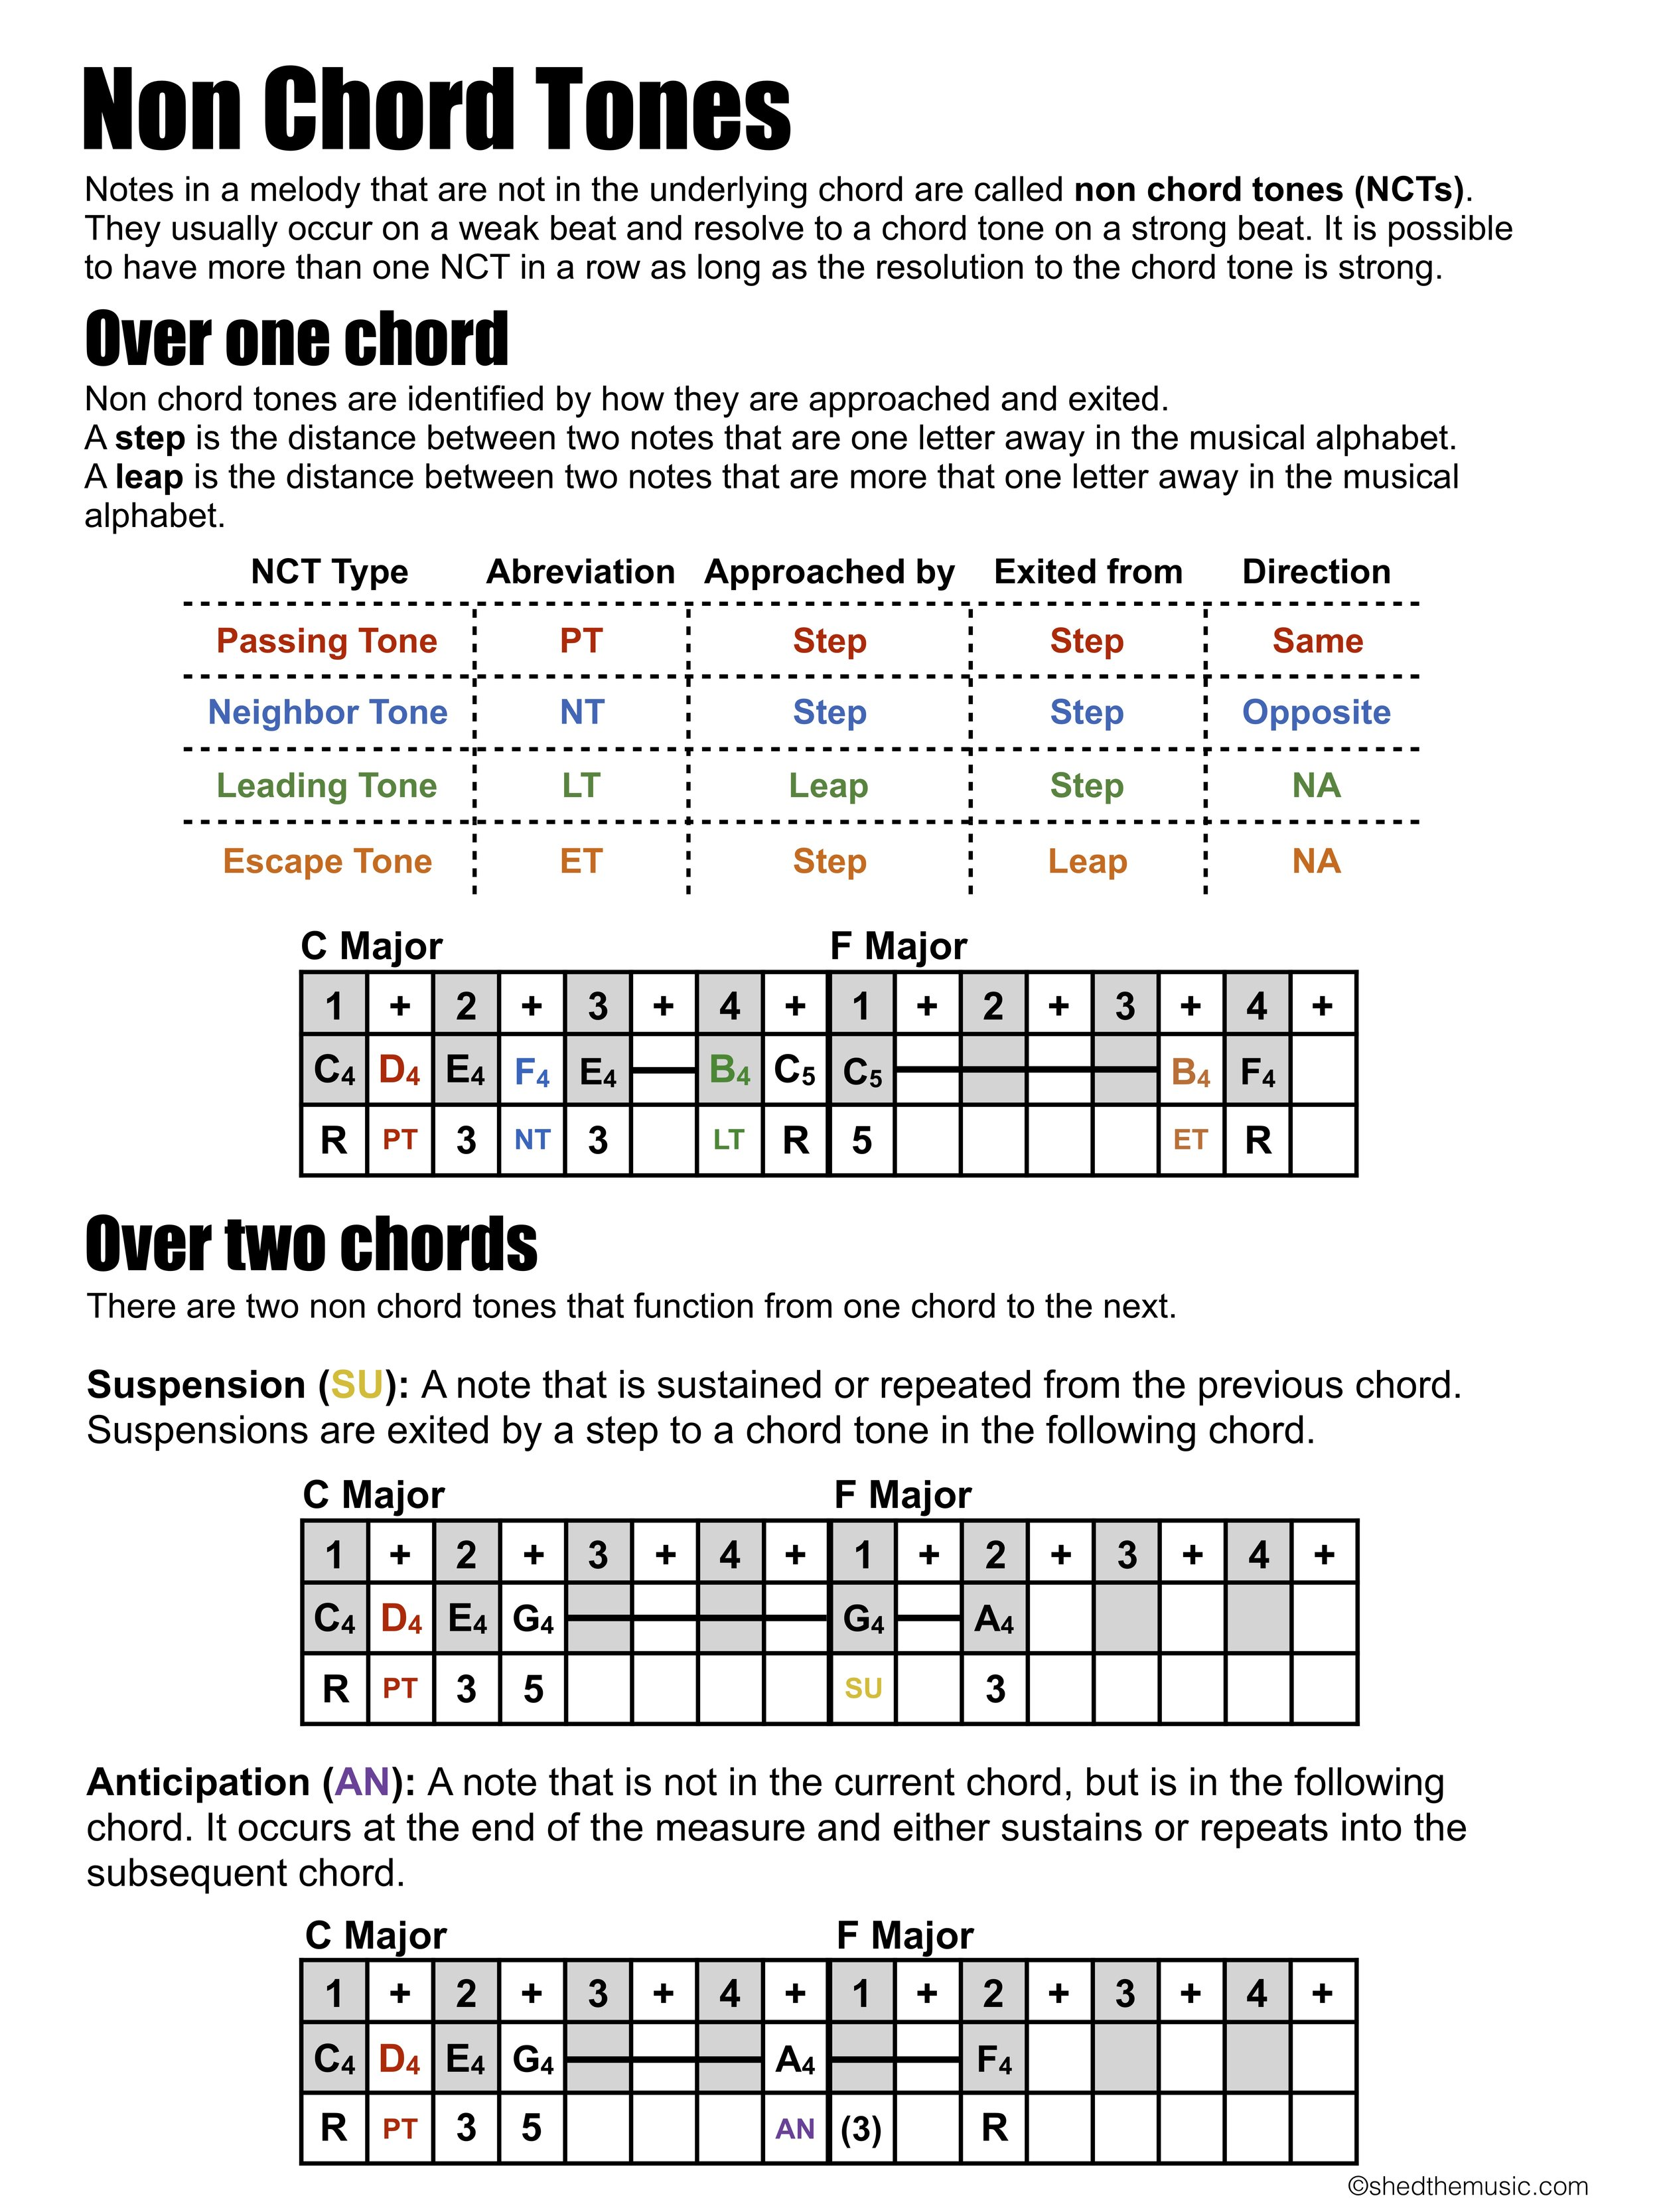 Non chord tones.jpg